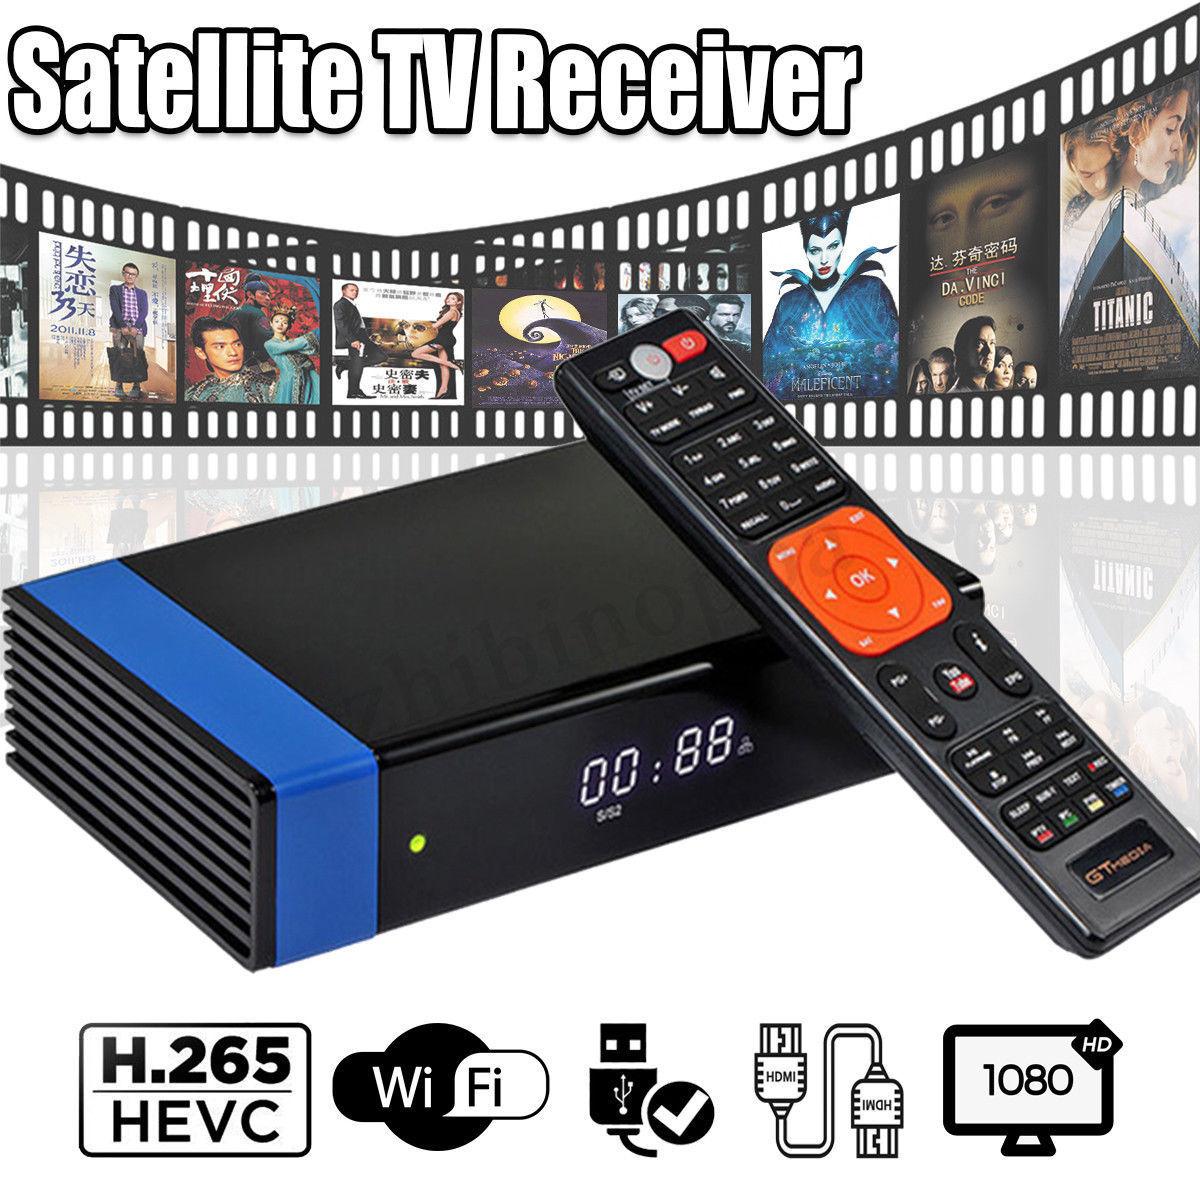 Italian IPTV S99X BOX DVB S2/T2/C Receptor Hybrid Tuner 3000 Live